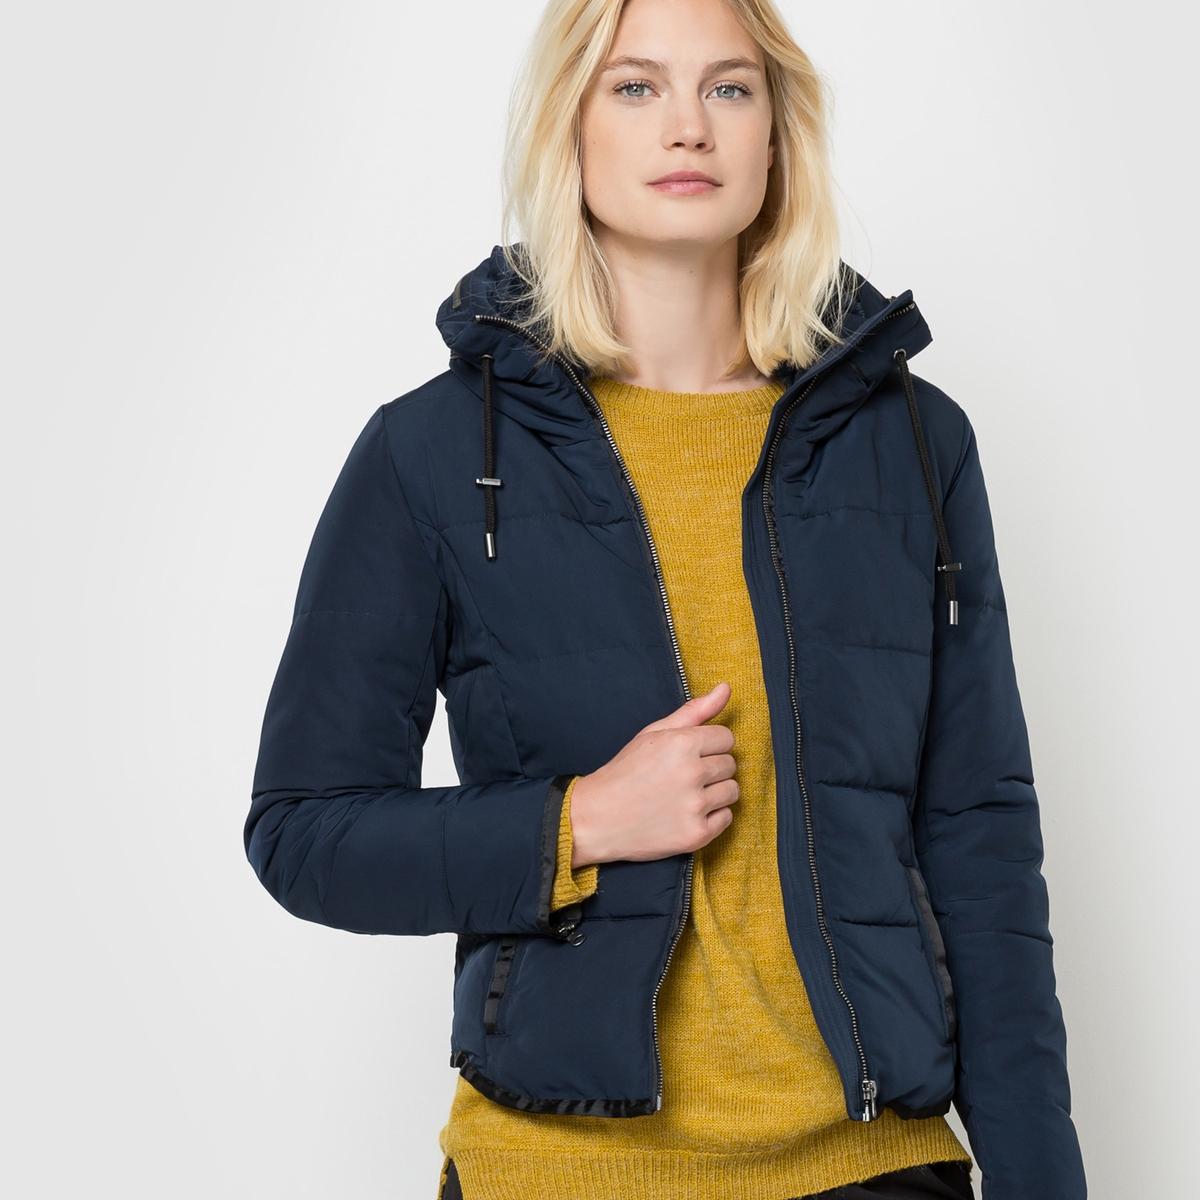 Куртка стёганая с капюшономСтёганая куртка с капюшоном ICHI. Застежка на молнию. 2 кармана спереди.          Состав и описание     Материал     100% полиэстера     Марка     ICHI<br><br>Цвет: темно-синий<br>Размер: M